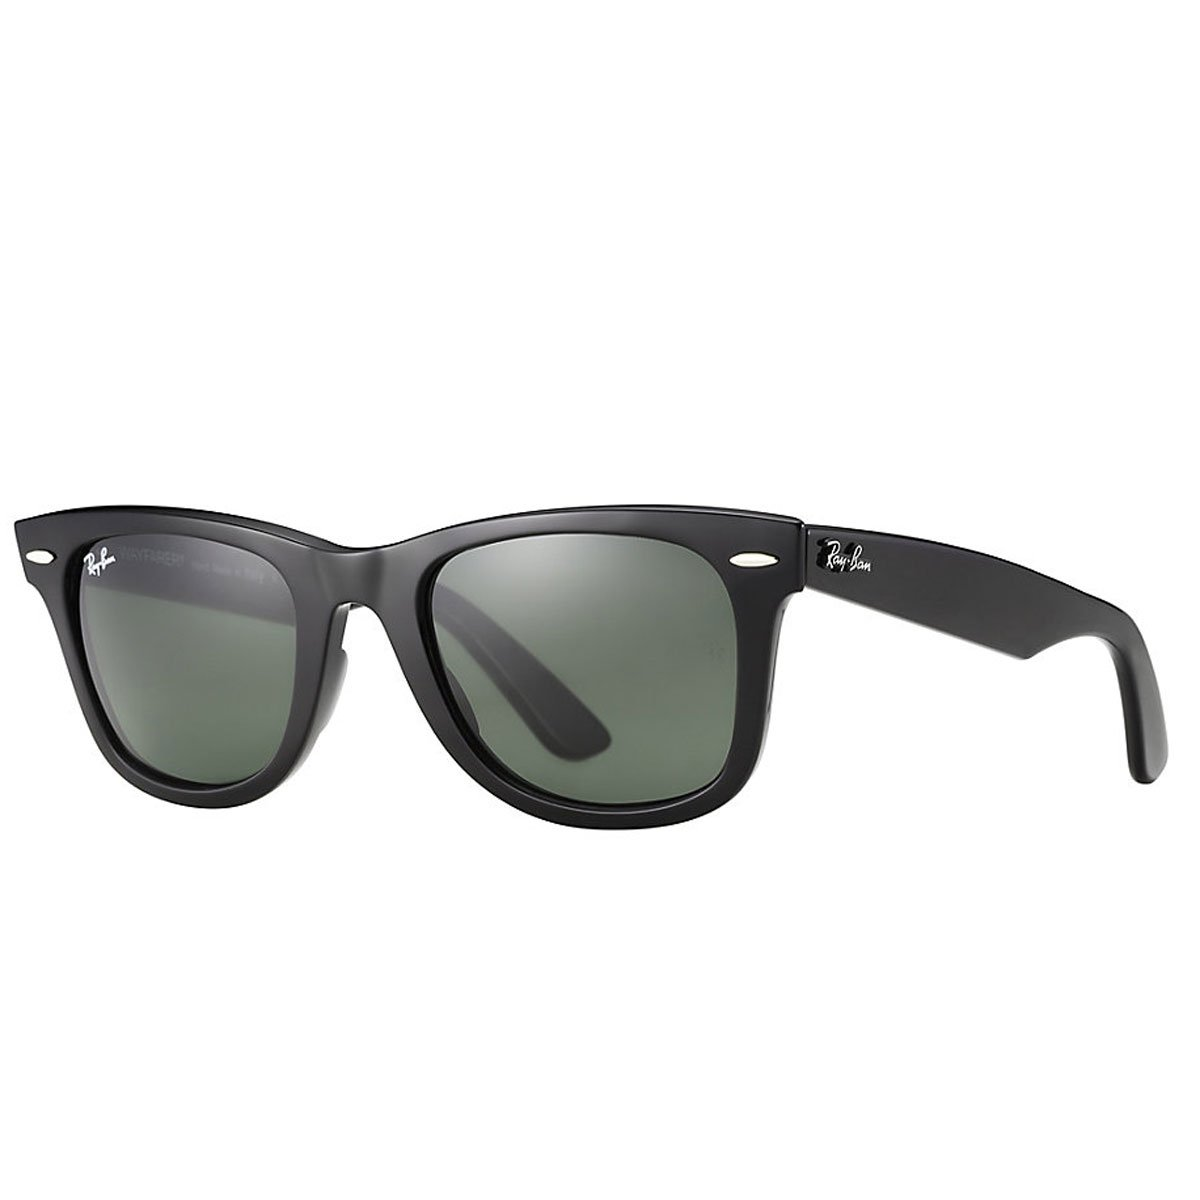 b745d21c5a6 Get Quotations · Ray-Ban RB2140 Original Wayfarer Sunglasses